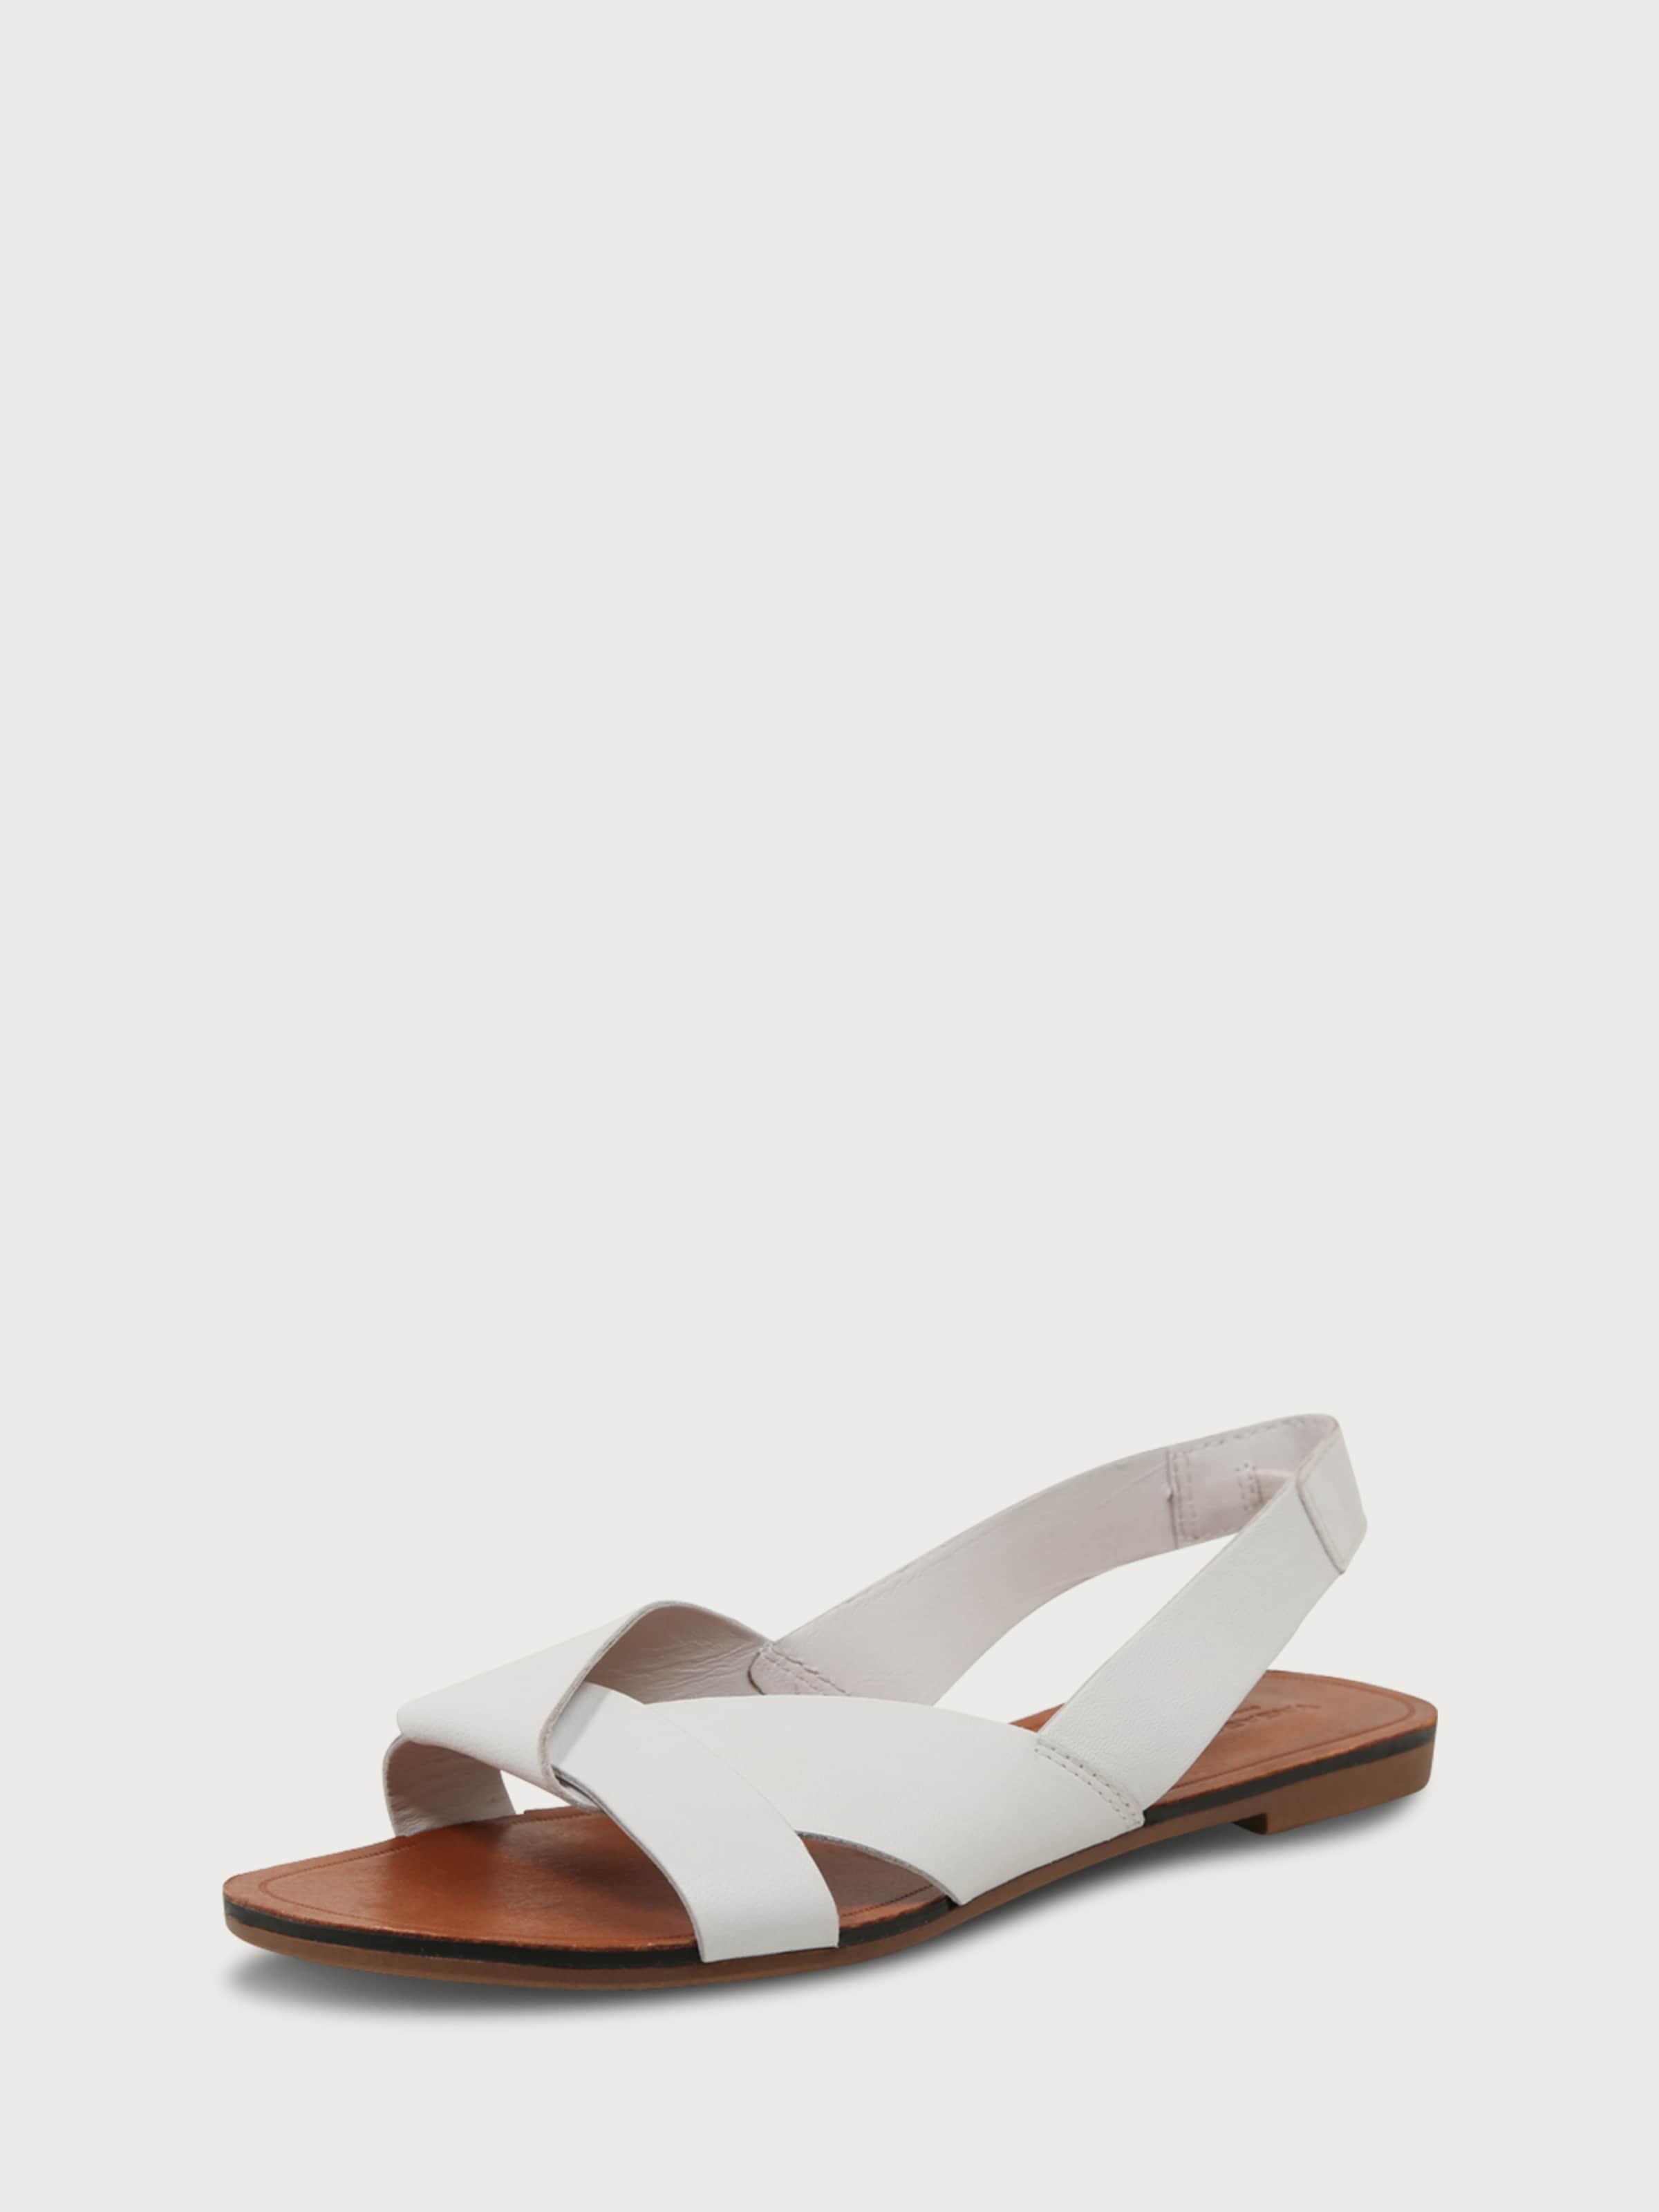 VAGABOND SHOEMAKERS Sandalen Tia Verschleißfeste billige Schuhe